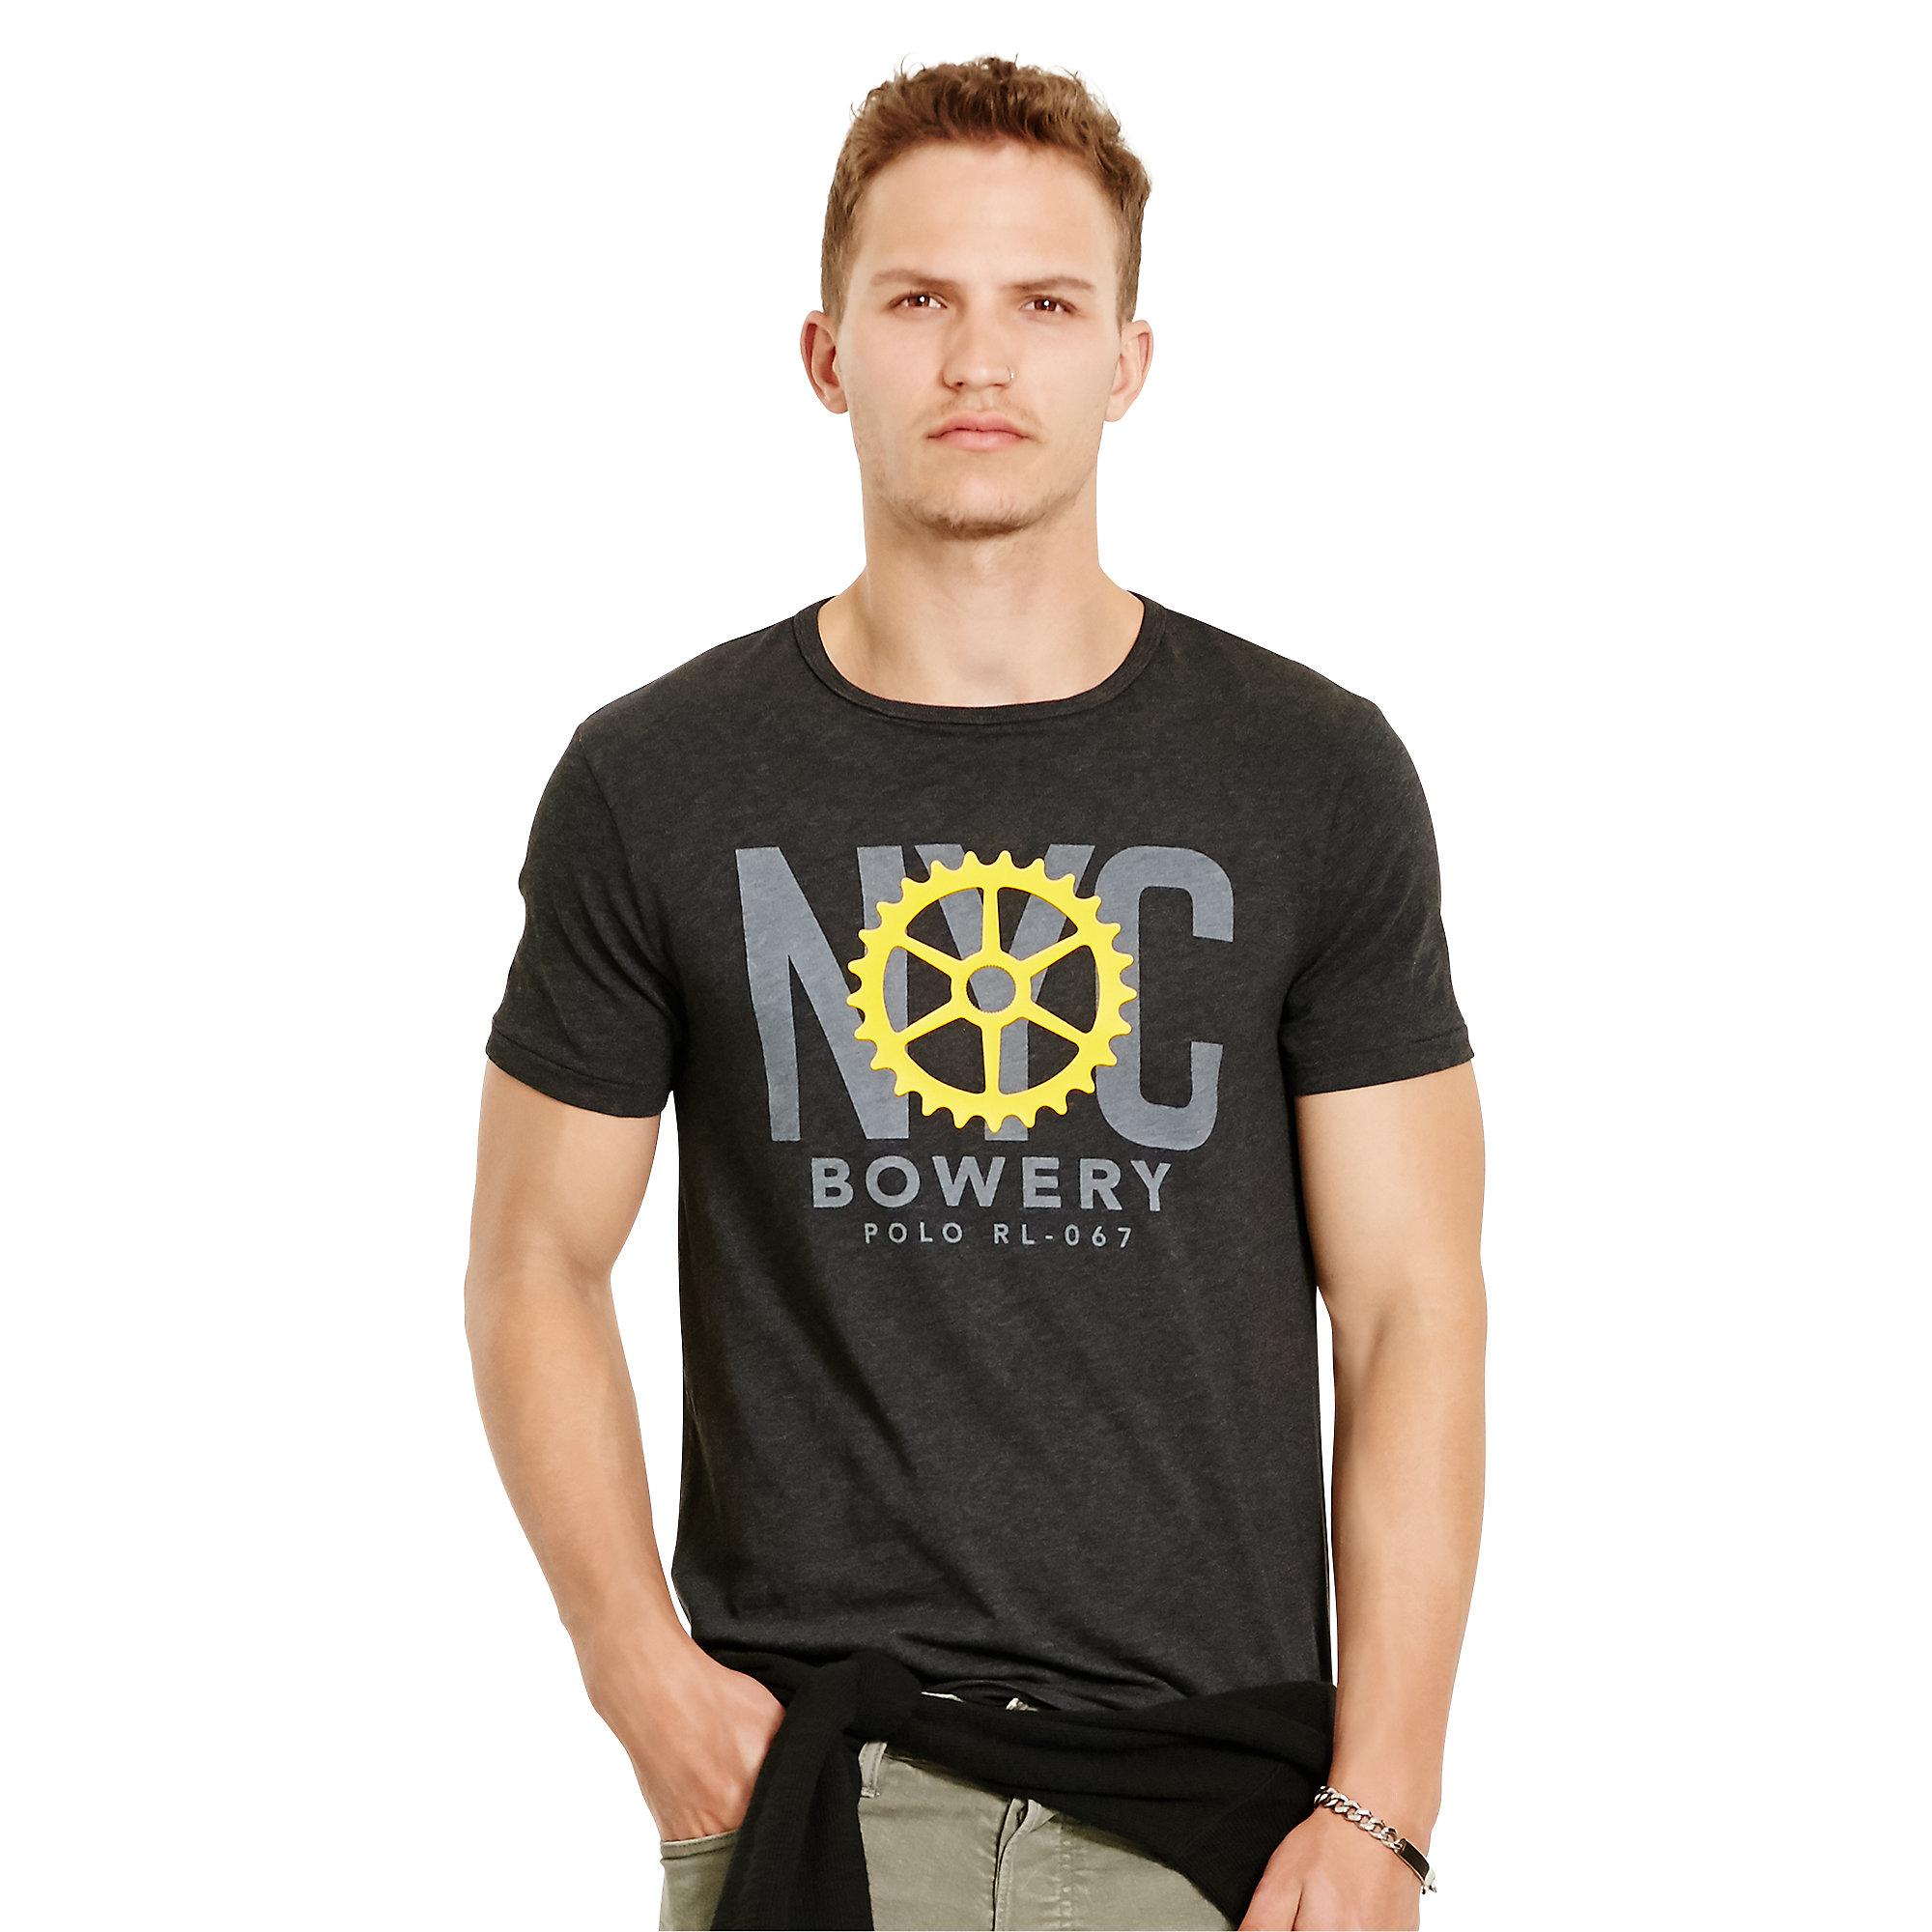 Polo ralph lauren custom fit cotton t shirt in black for for Polo custom fit t shirts